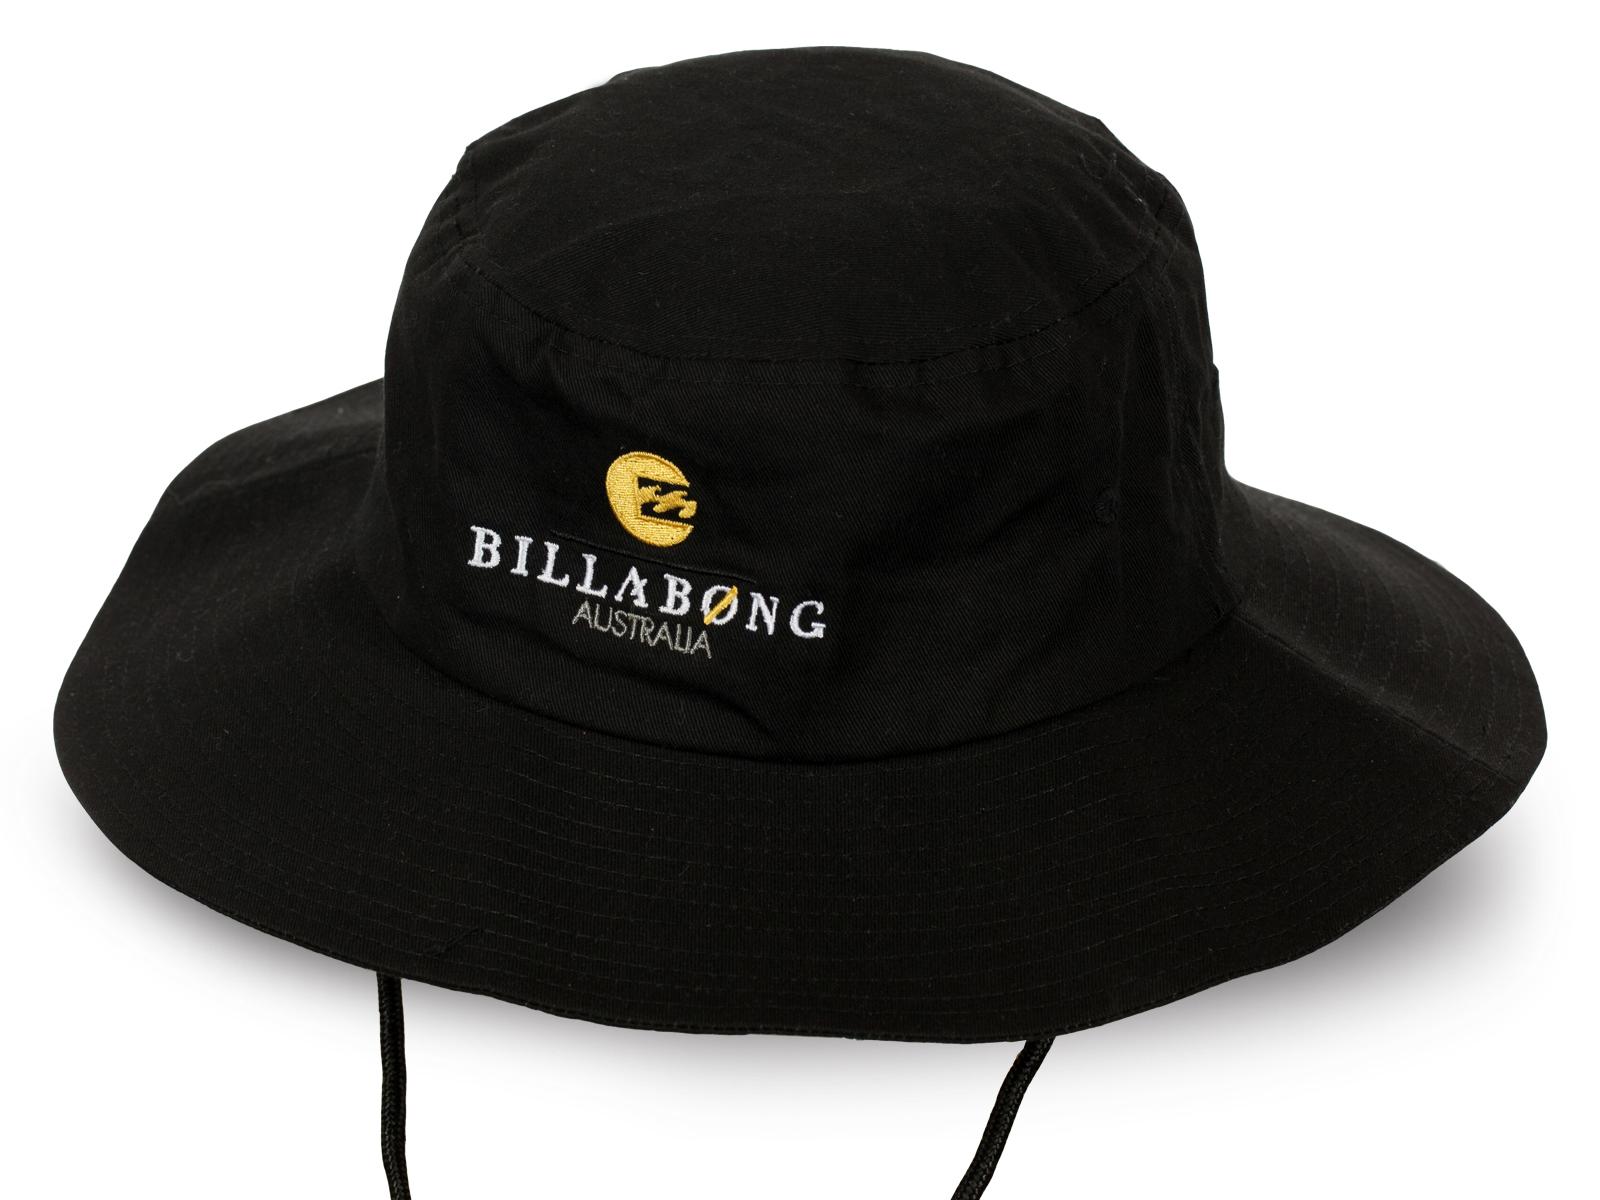 Австралийская панама от BillaBong